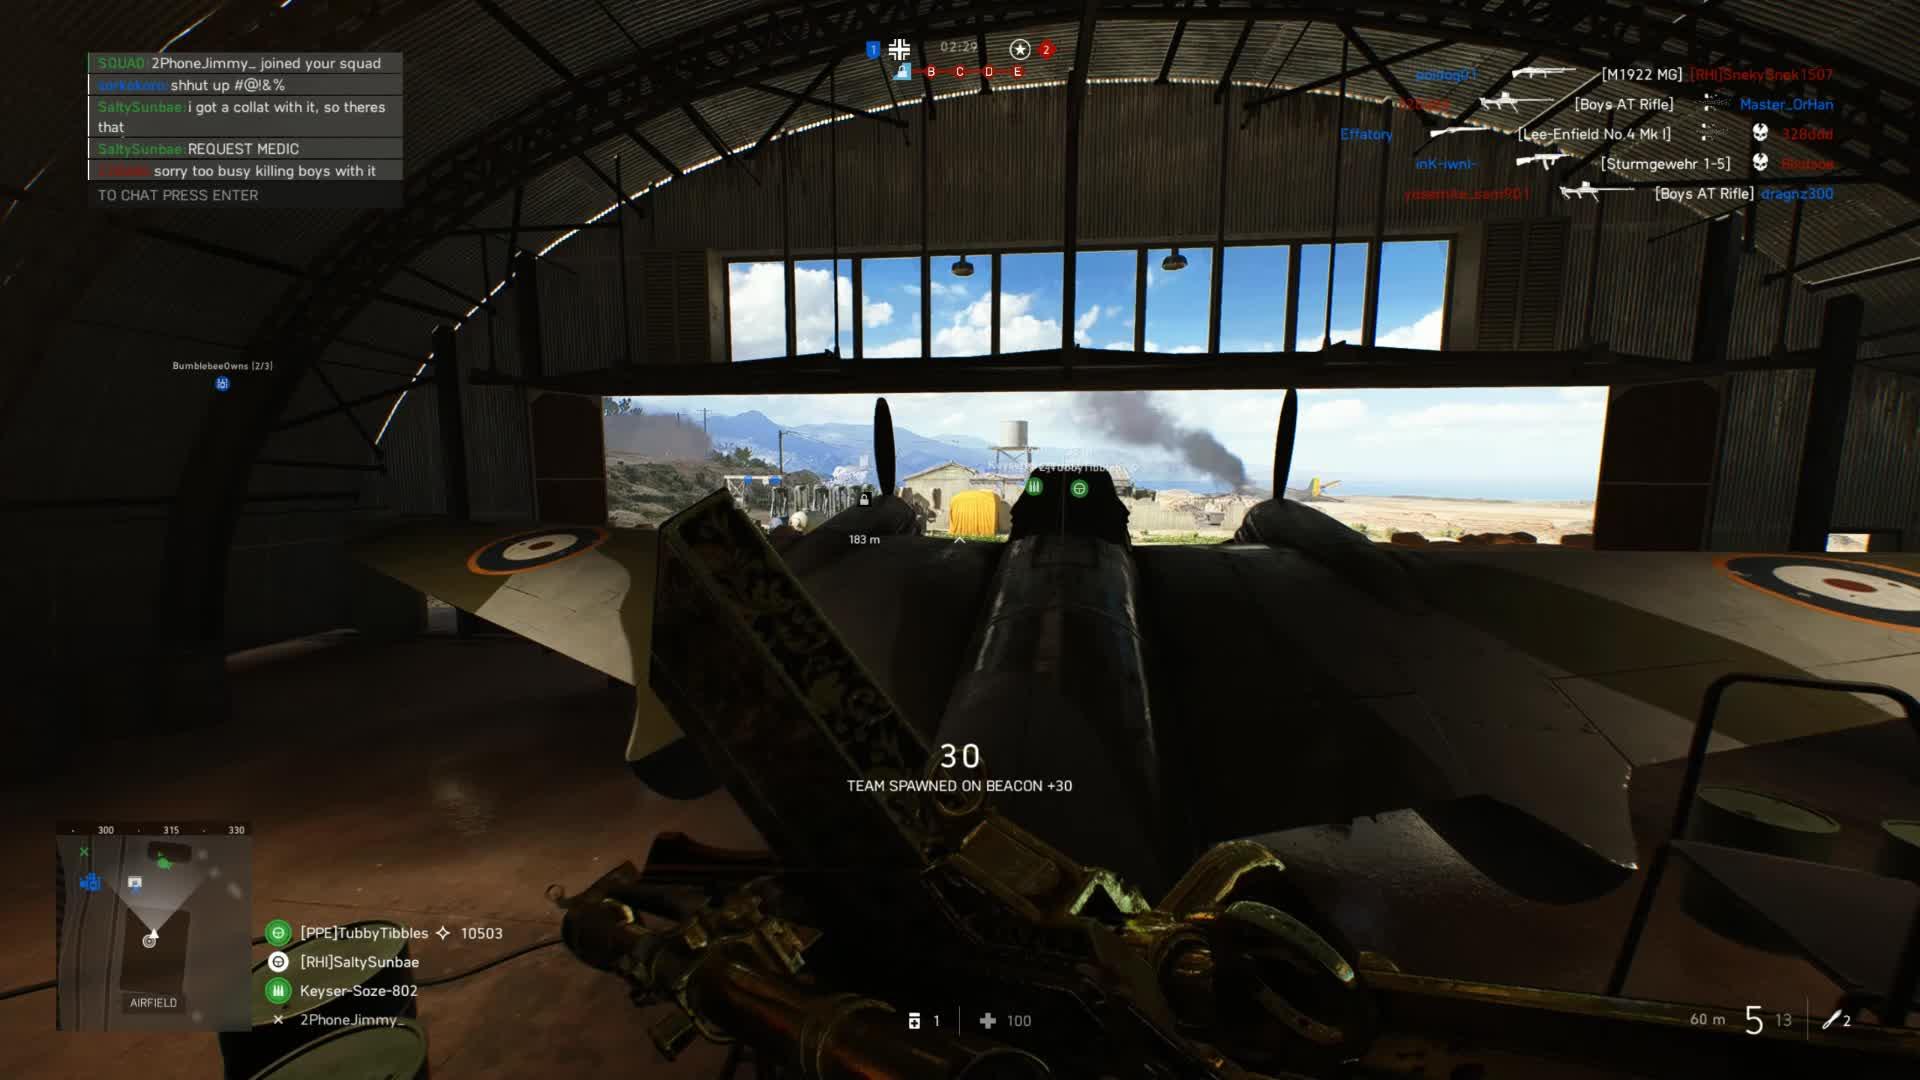 tank last hit GIFs